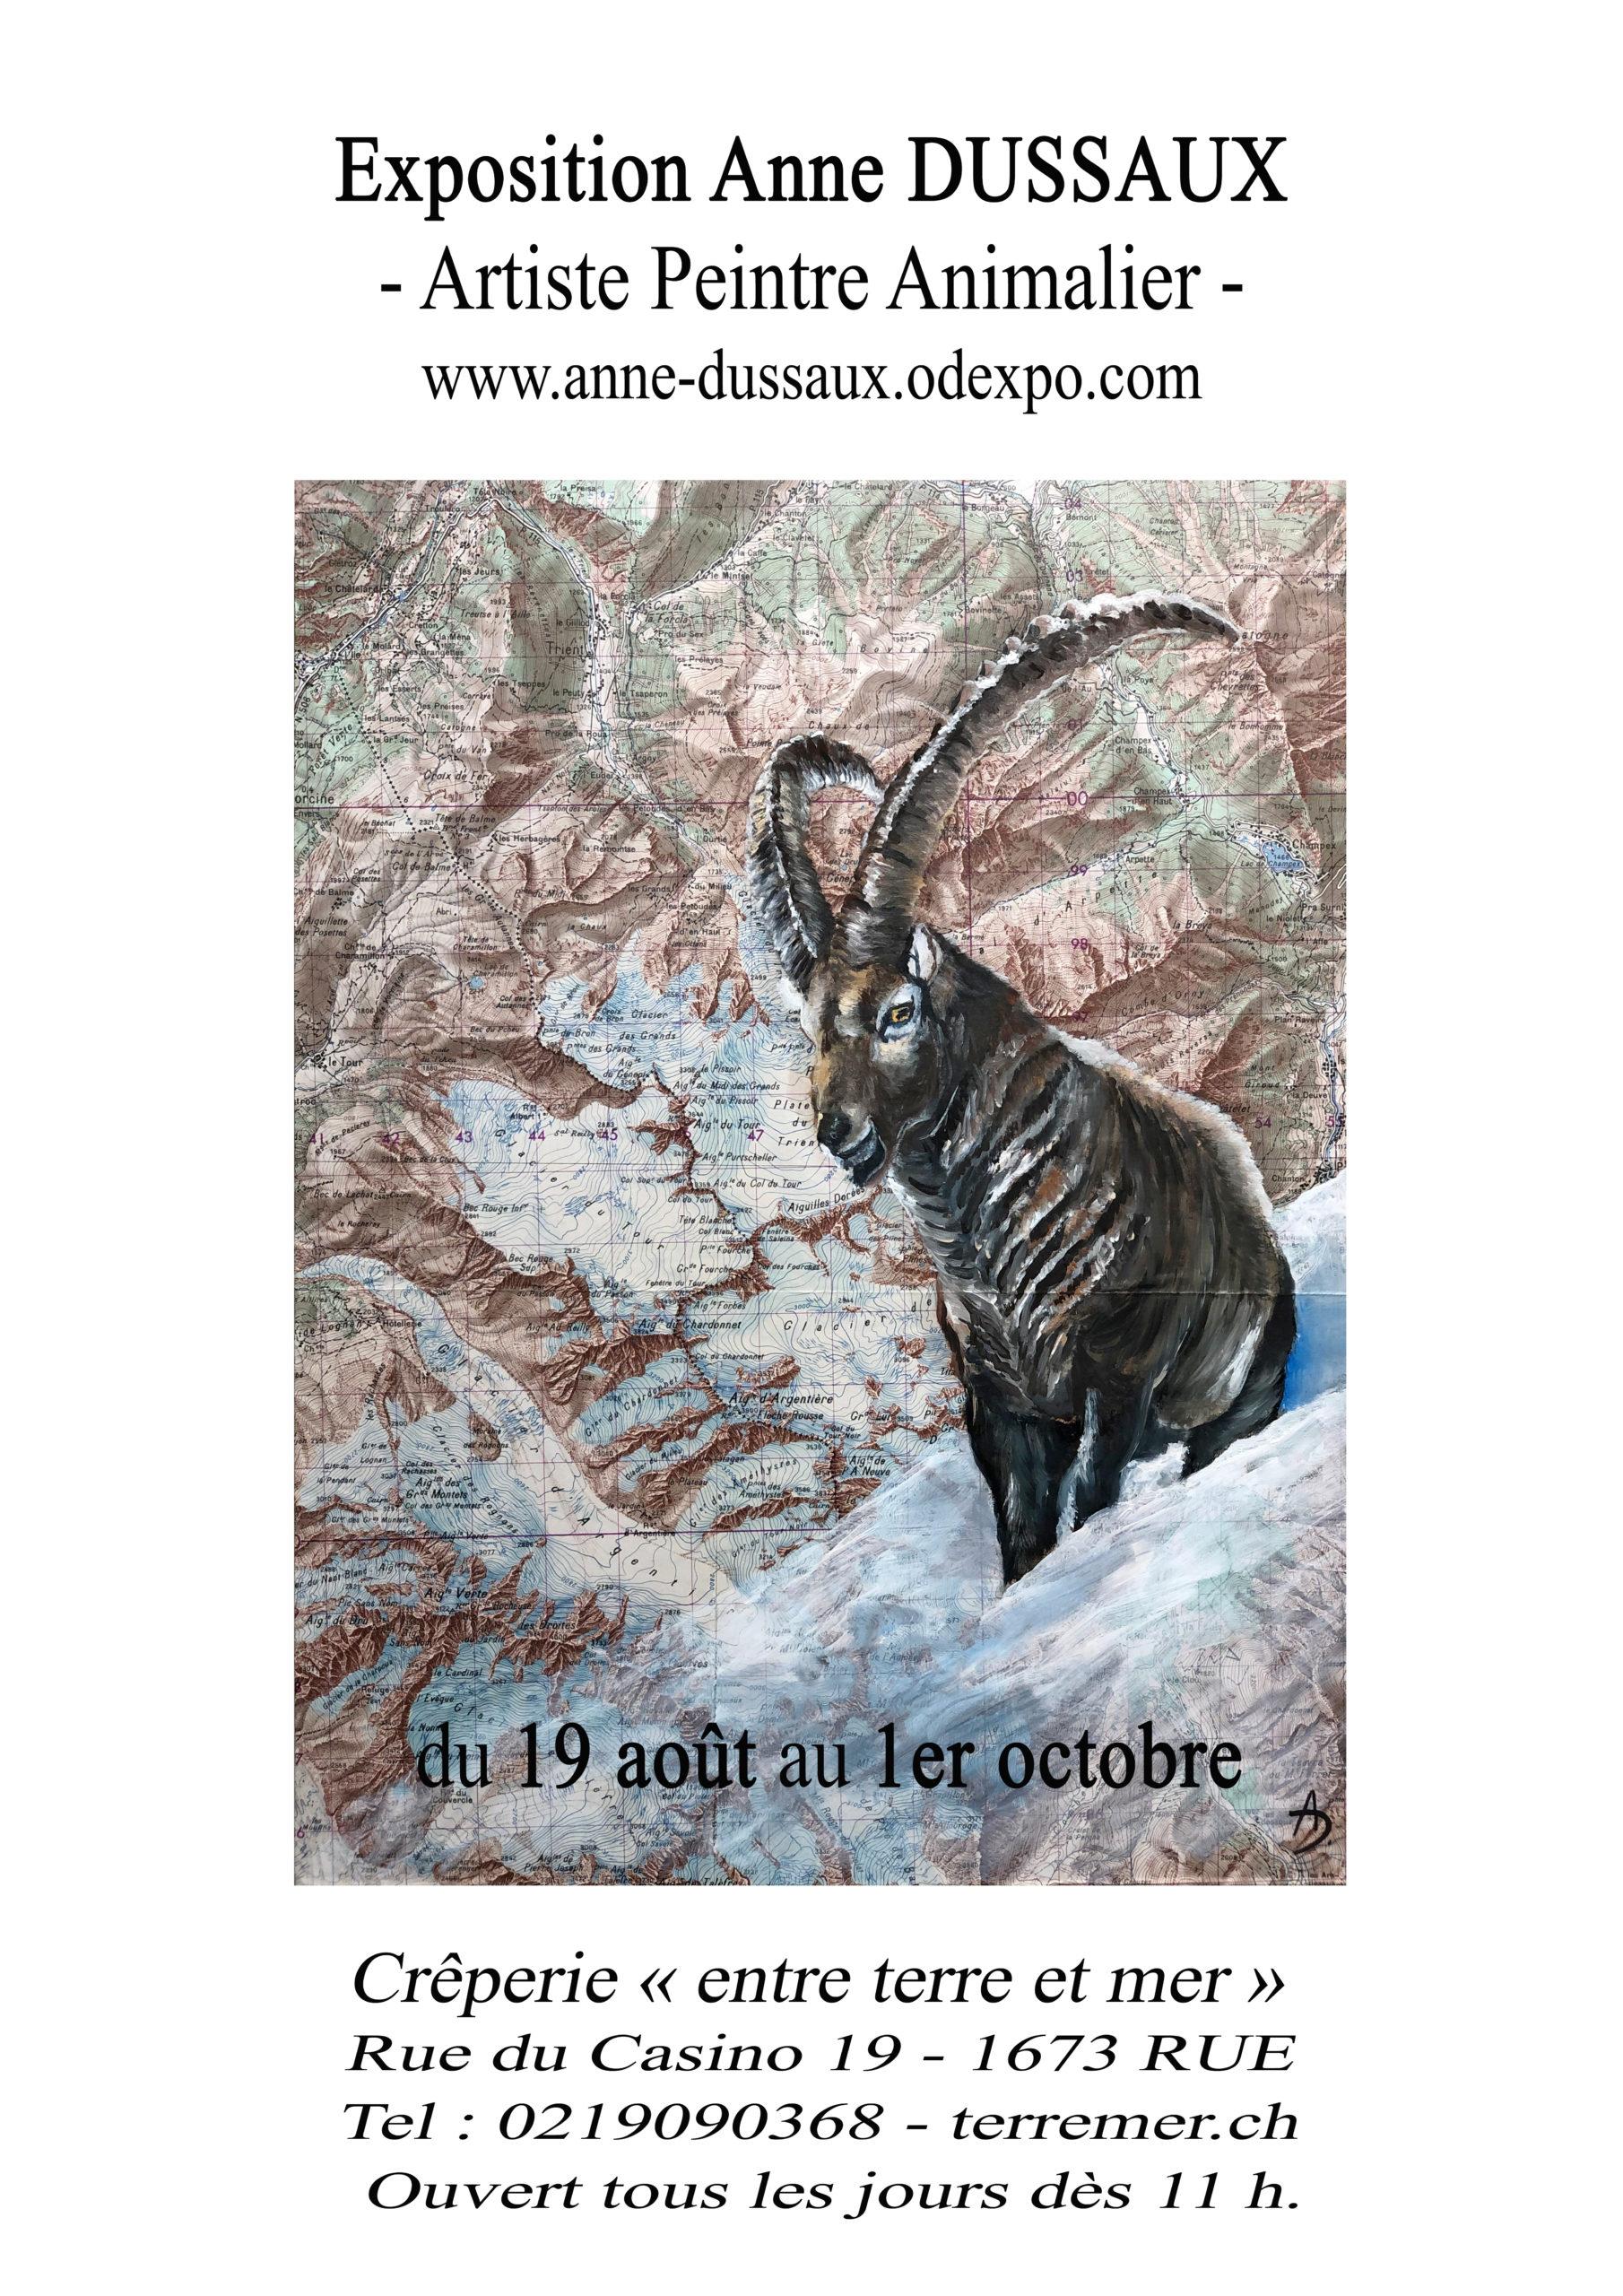 Anne Dussaux